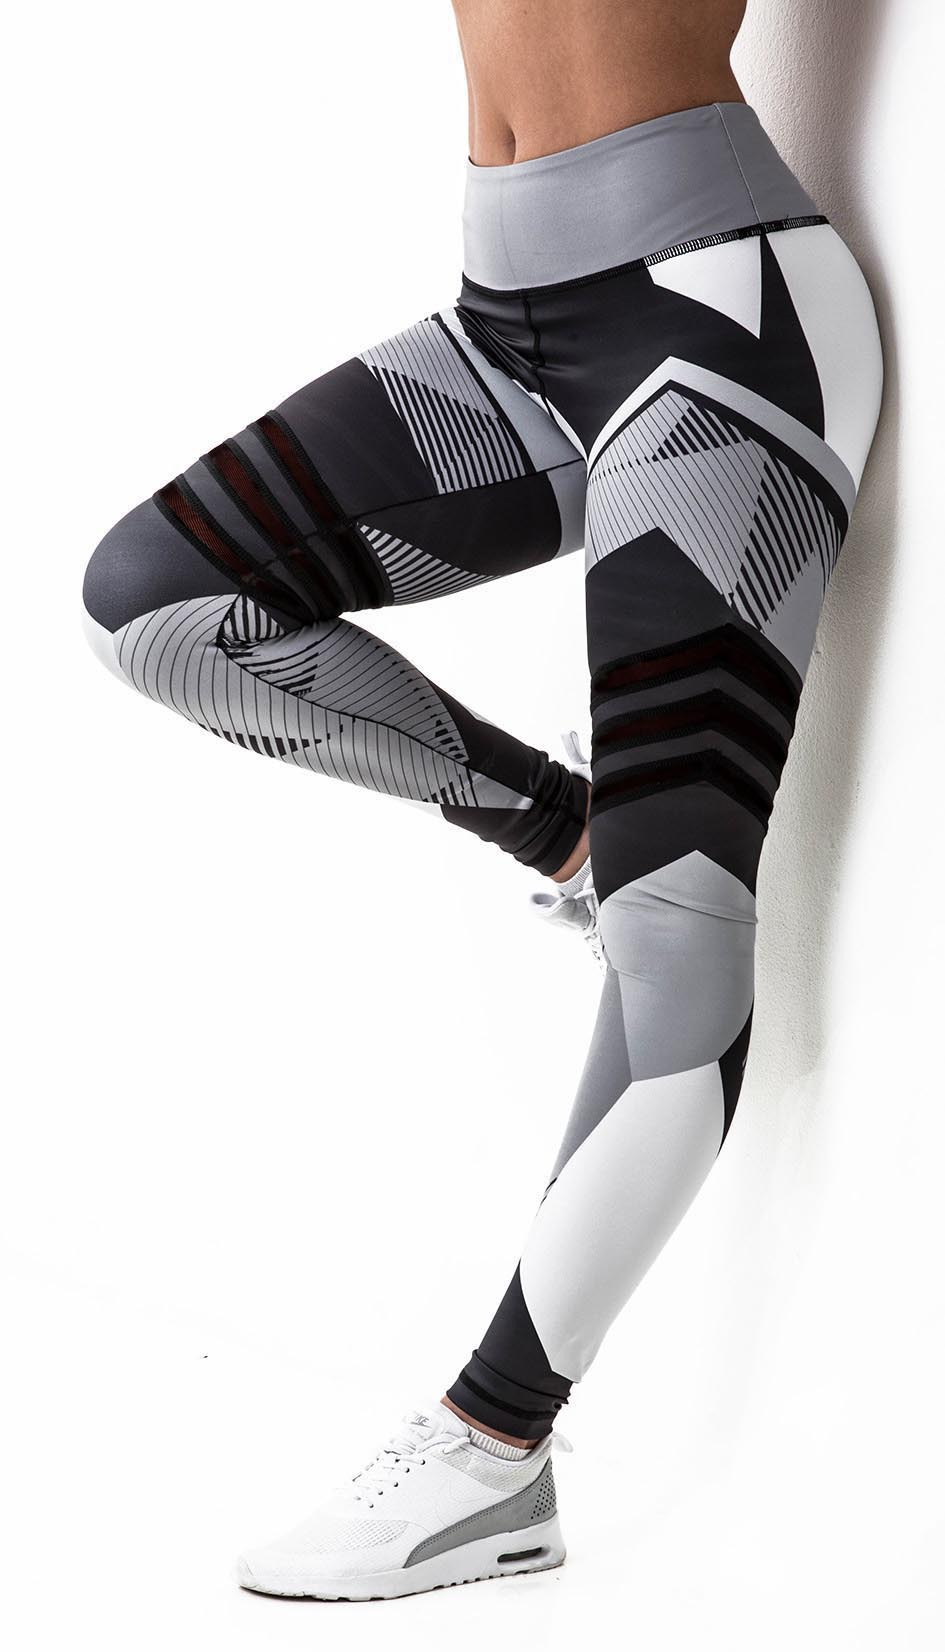 Fitness Leggings for Women Gothic Push Up Leggings High Elastic Workout Leggings Clothing Sexy Sporting 3d Leggings Plus Size